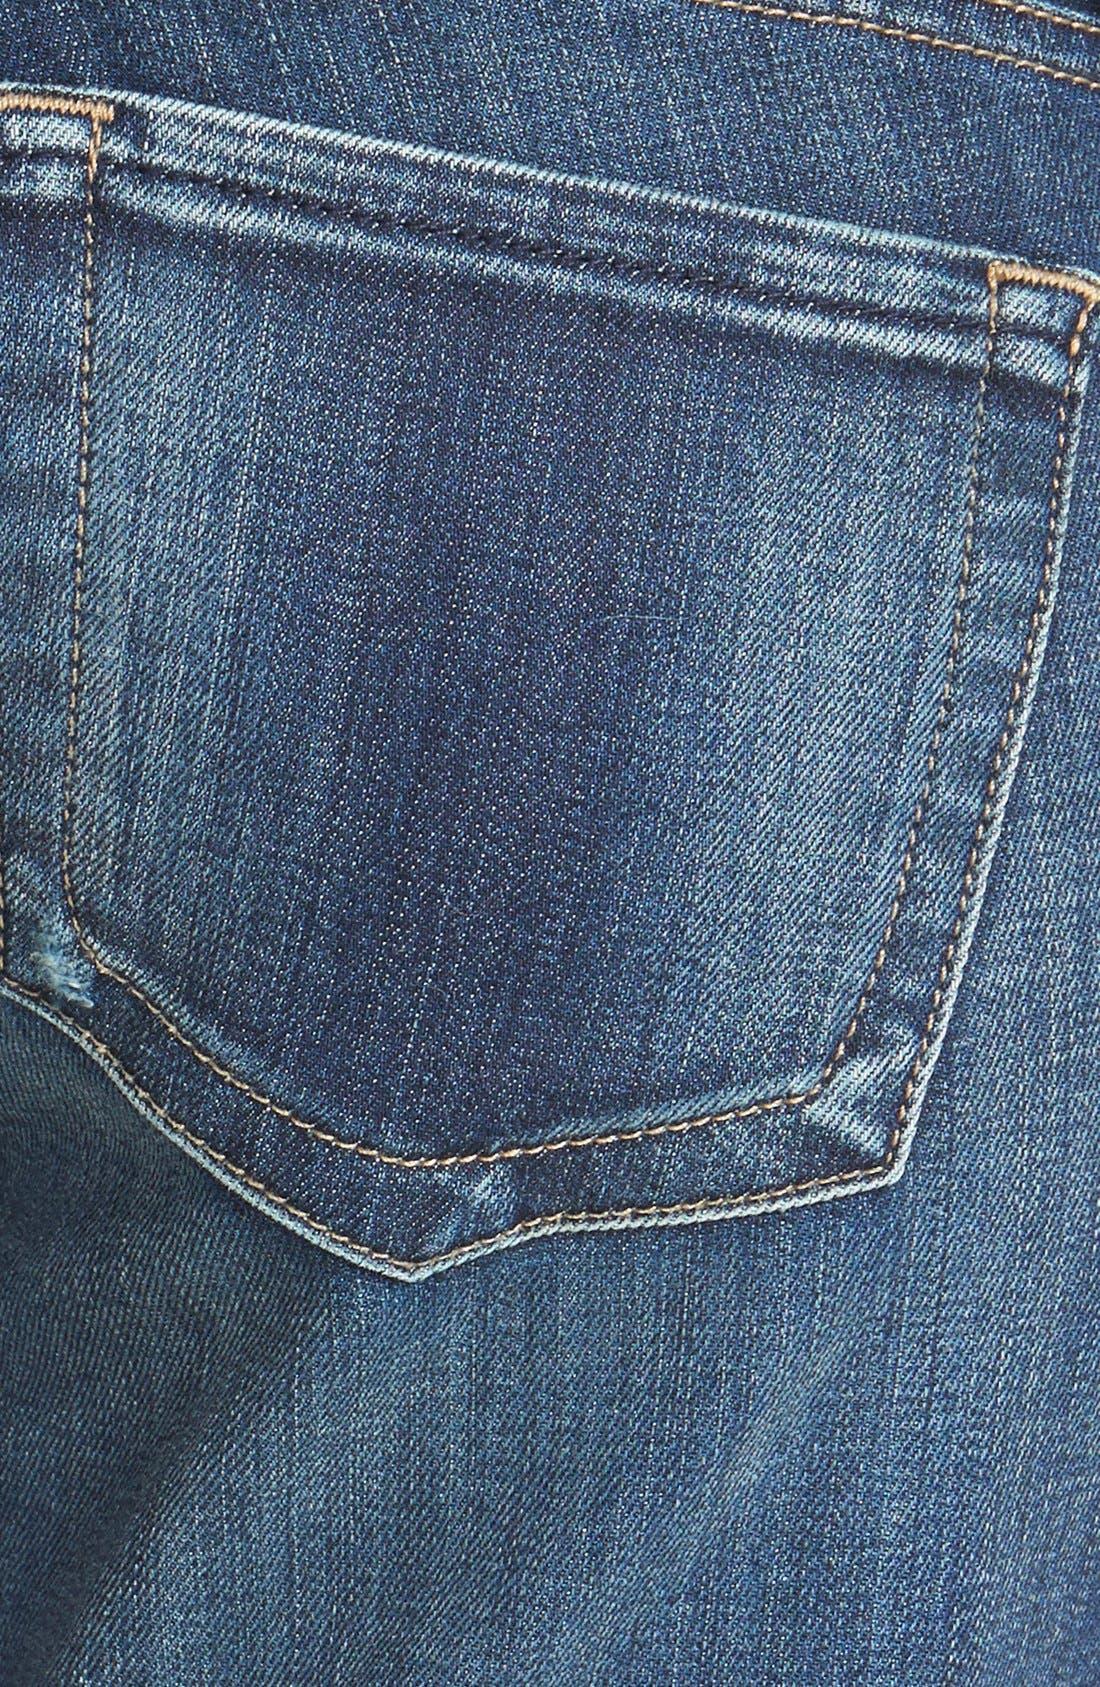 Alternate Image 3  - KUT from the Kloth 'Catherine' Destructed Slim Boyfriend Jeans (Dimple)